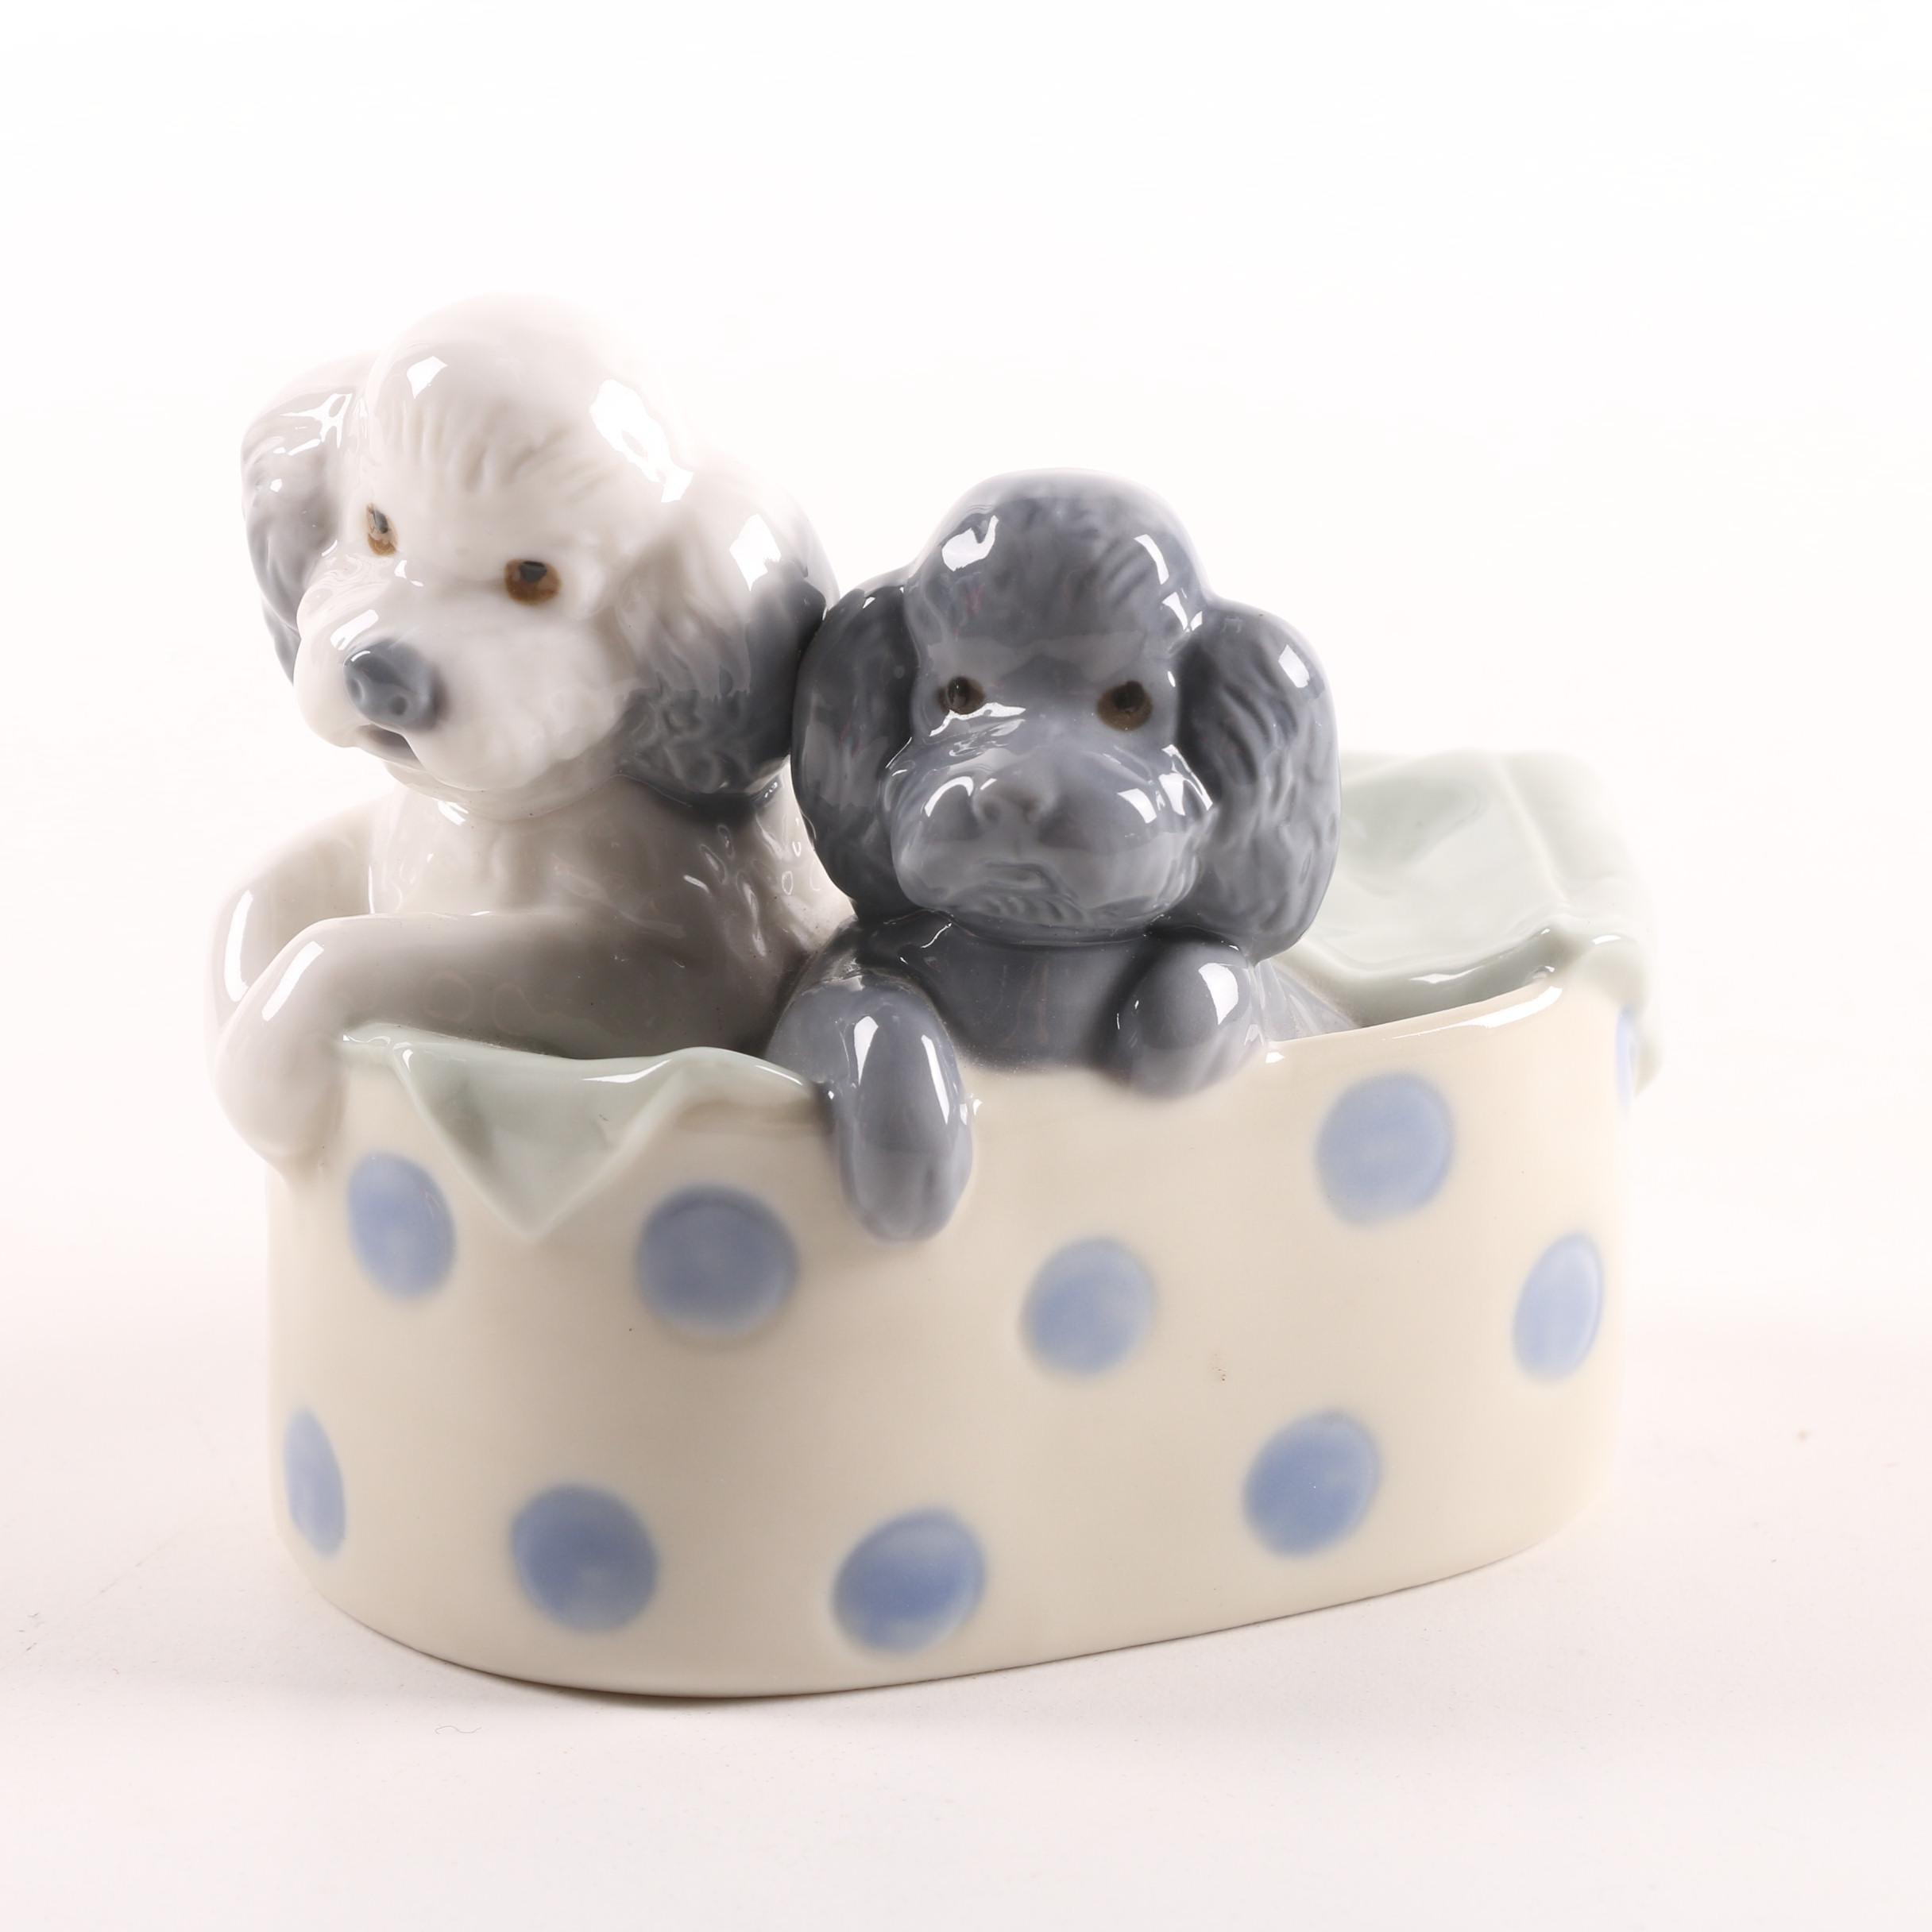 "1988 NAO Lladró ""Puppies in a Basket"" Figurine"